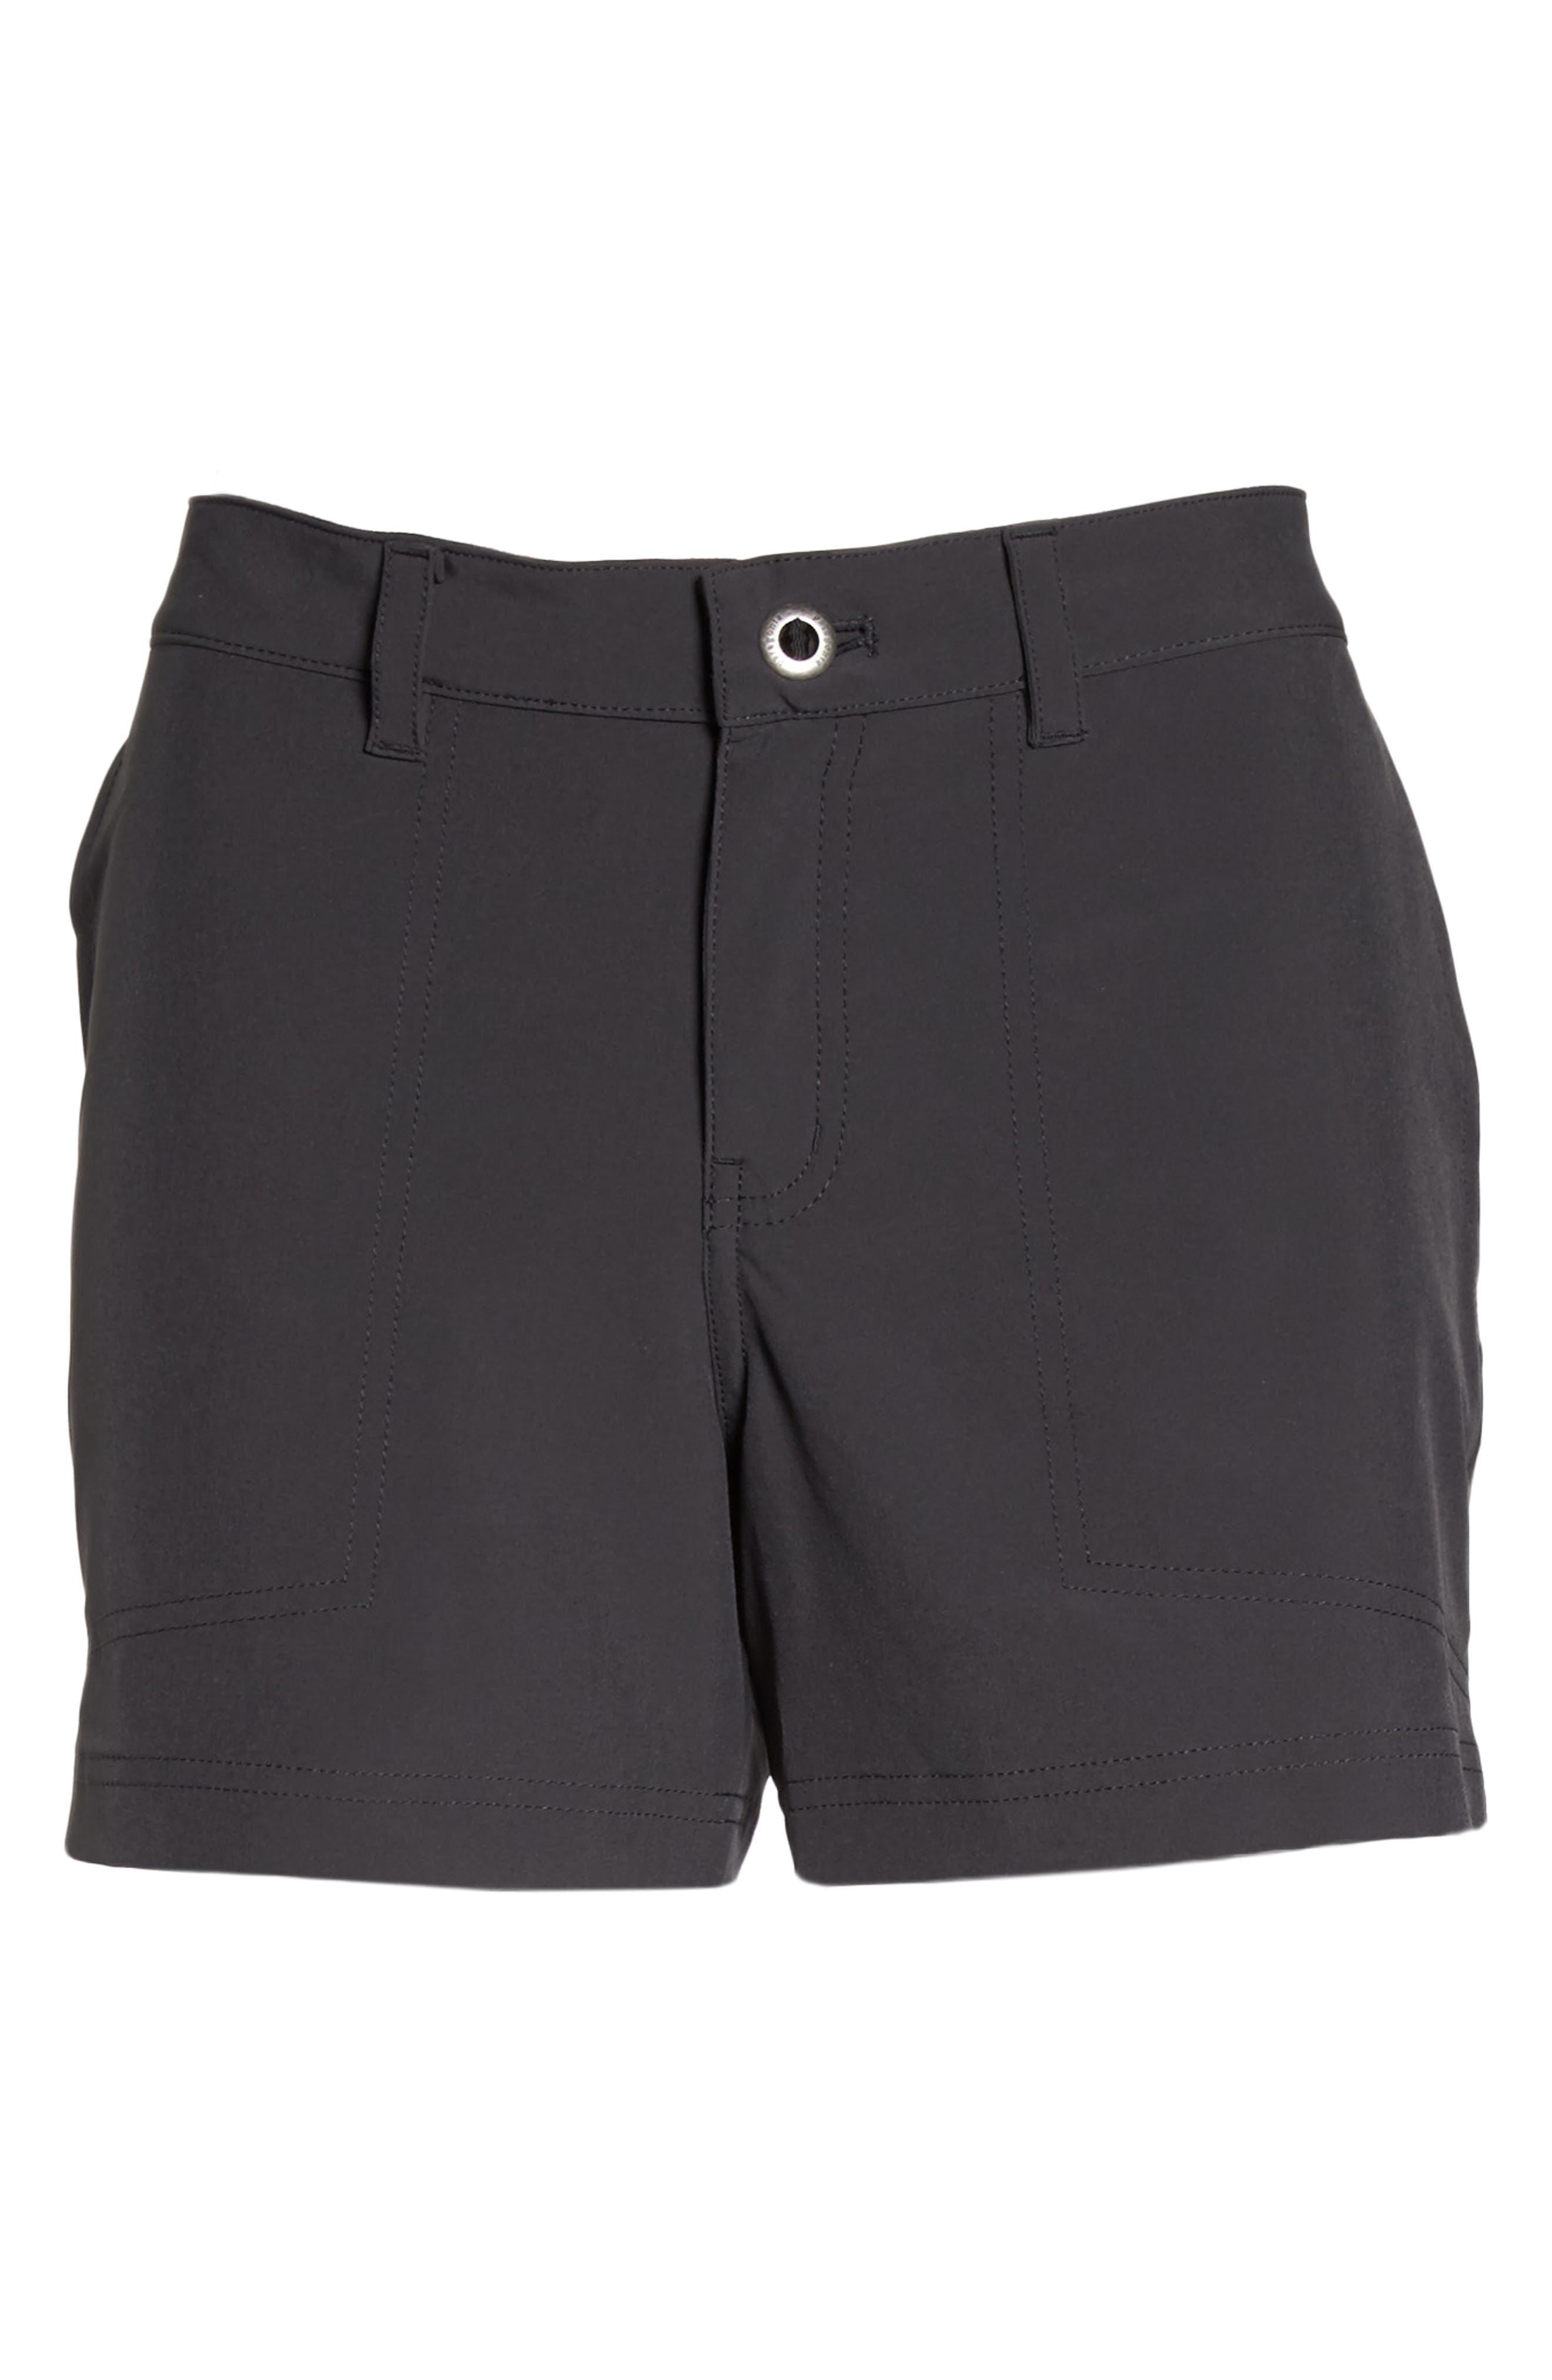 Happy Hike Shorts,                             Alternate thumbnail 12, color,